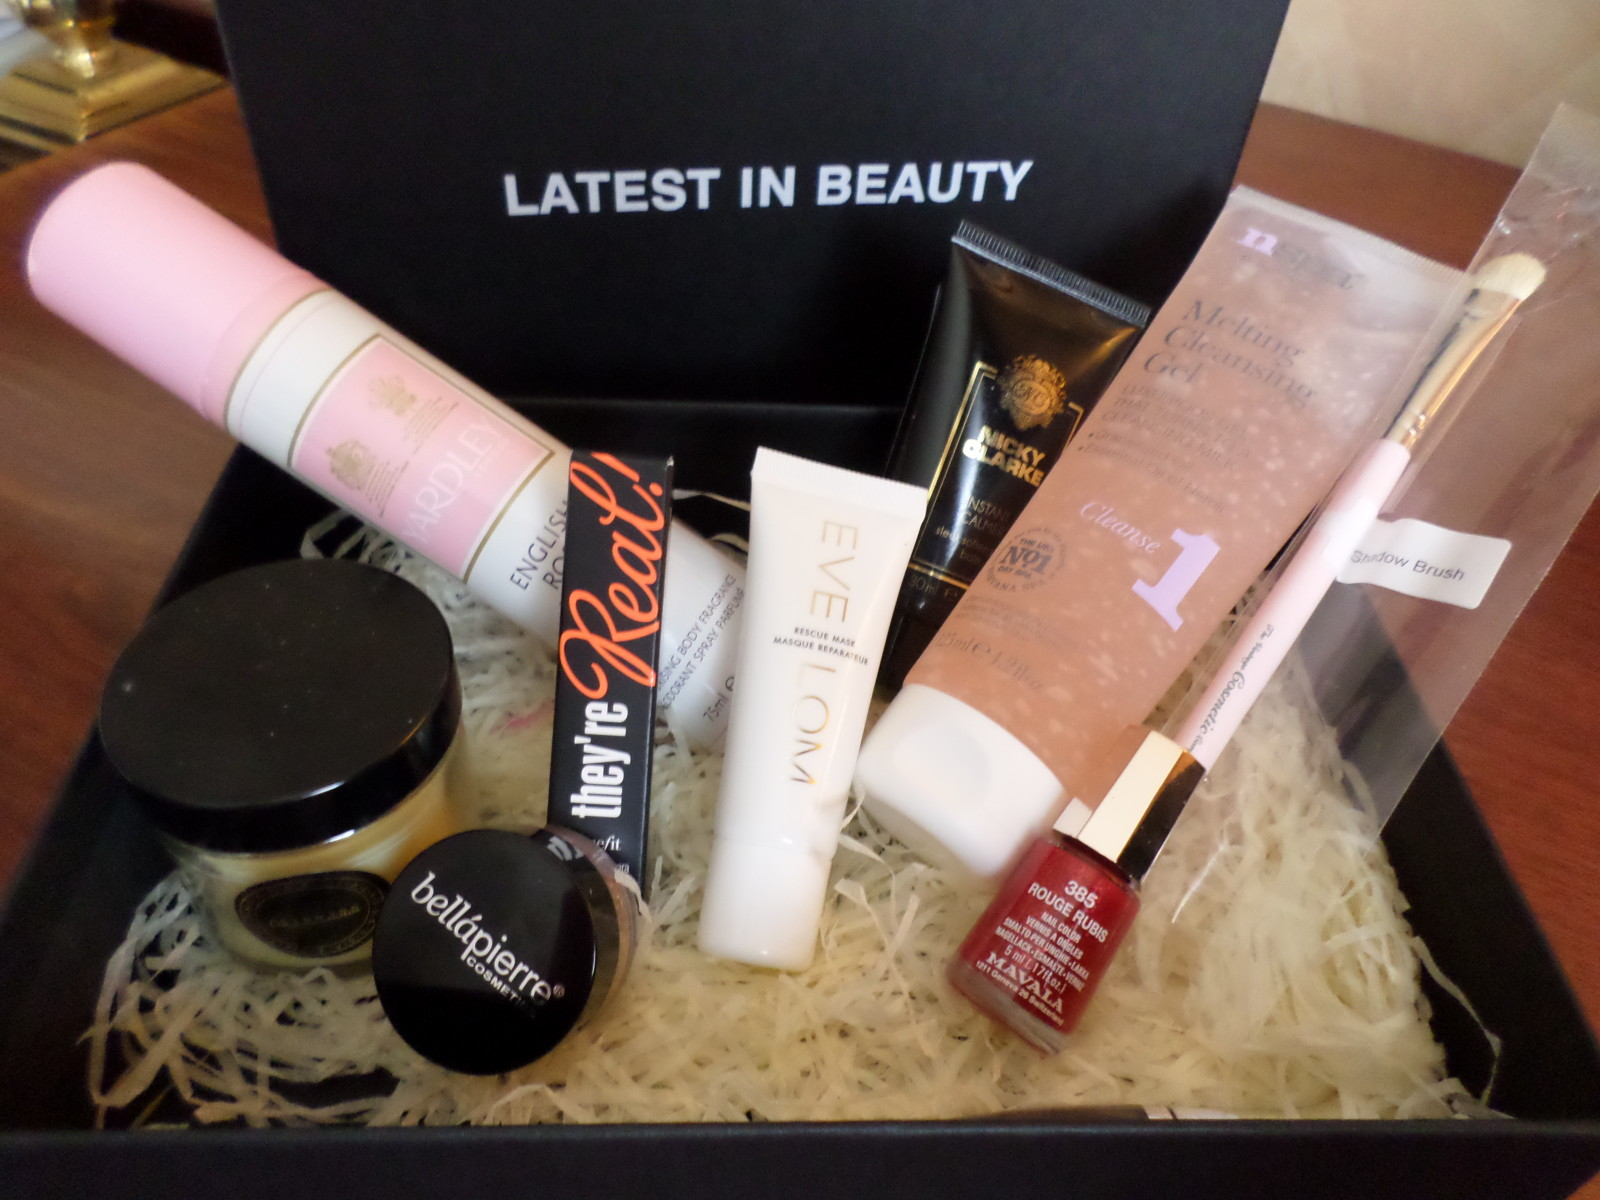 Latest in Beauty Box: The Editors Pick - Anoushka Loves